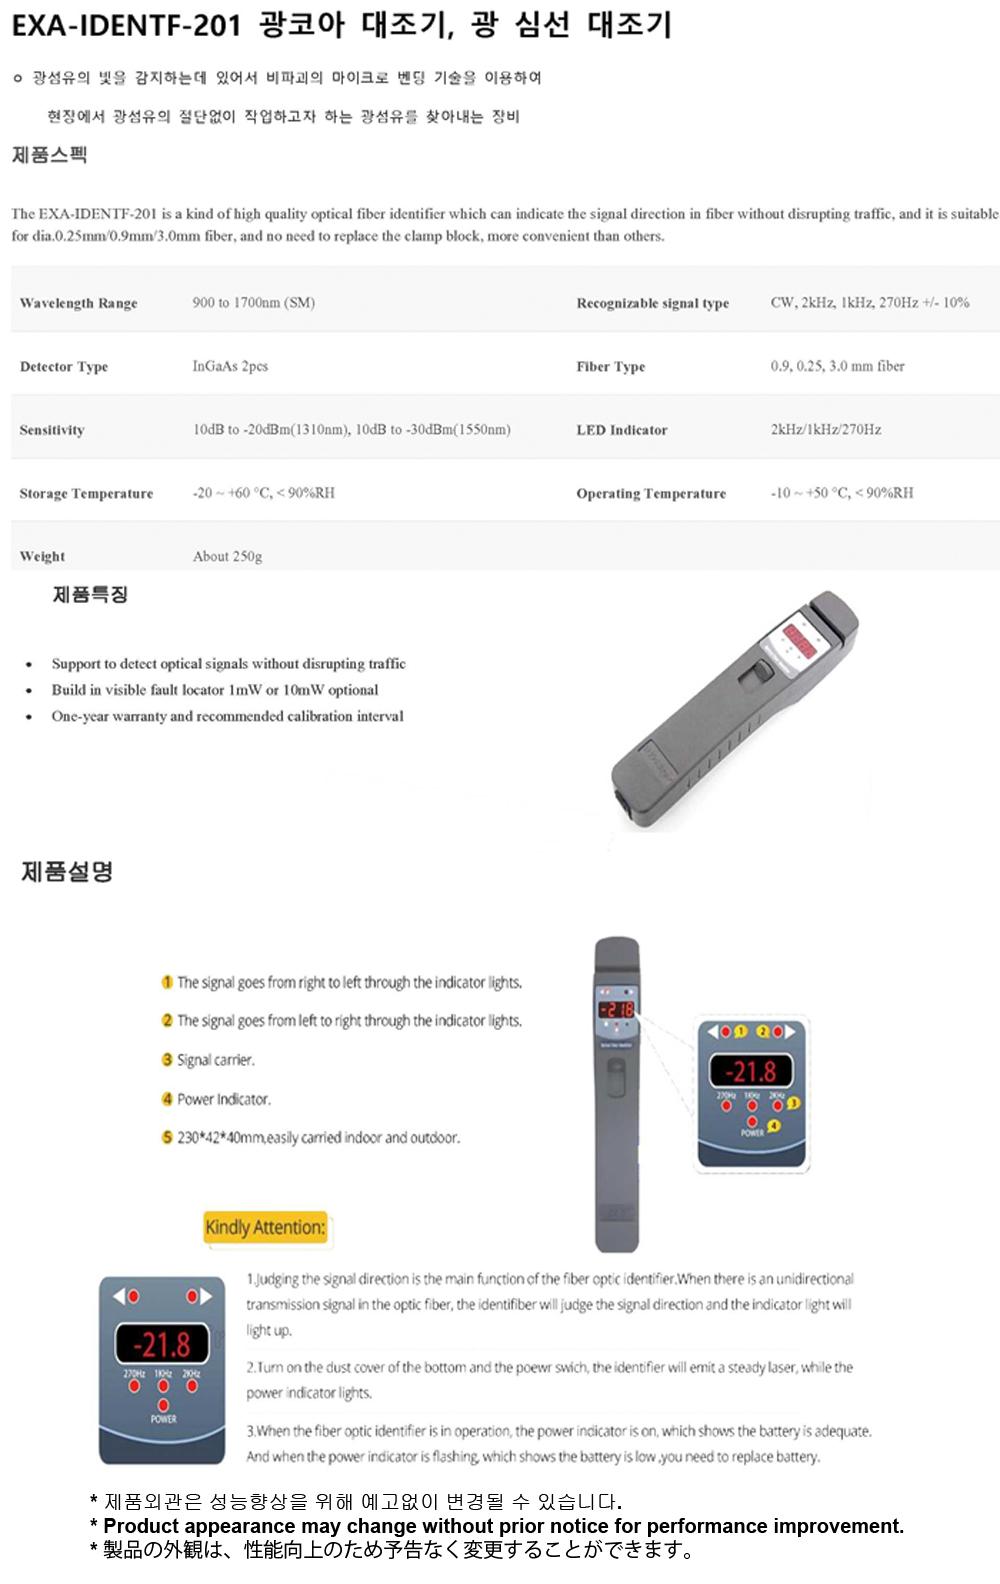 [EXA] Optical Fiber Identifier,EXA-IDENTF-201